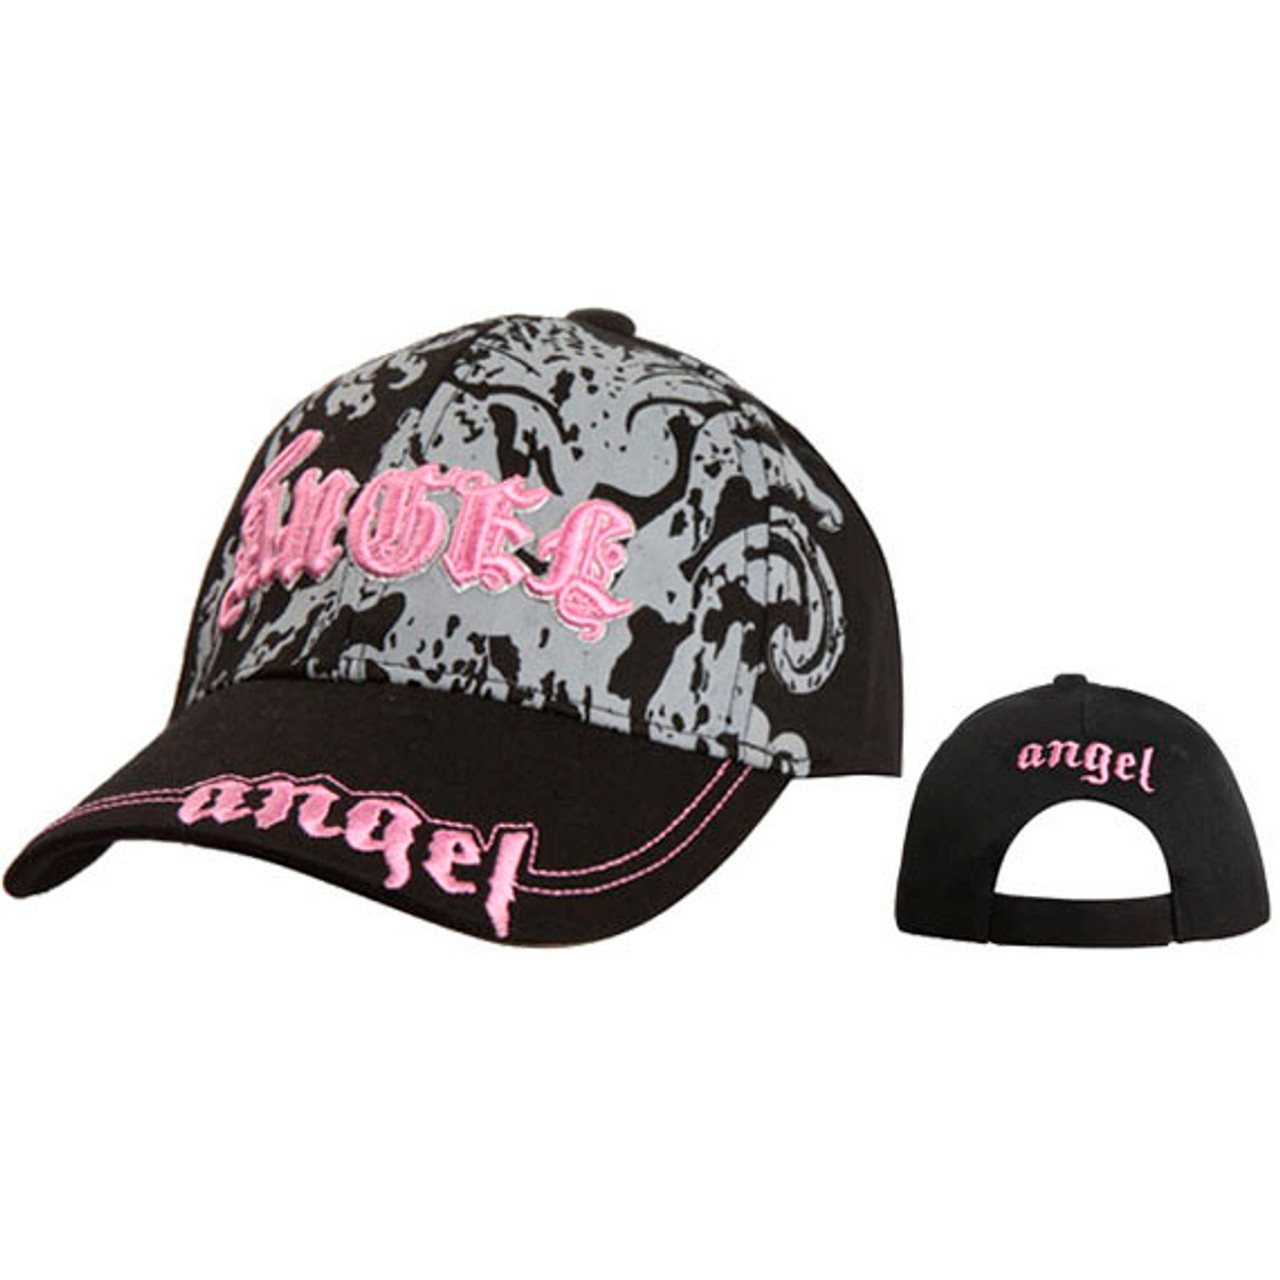 "Wholesale ""Angel"" Hats for Juniors' Black"